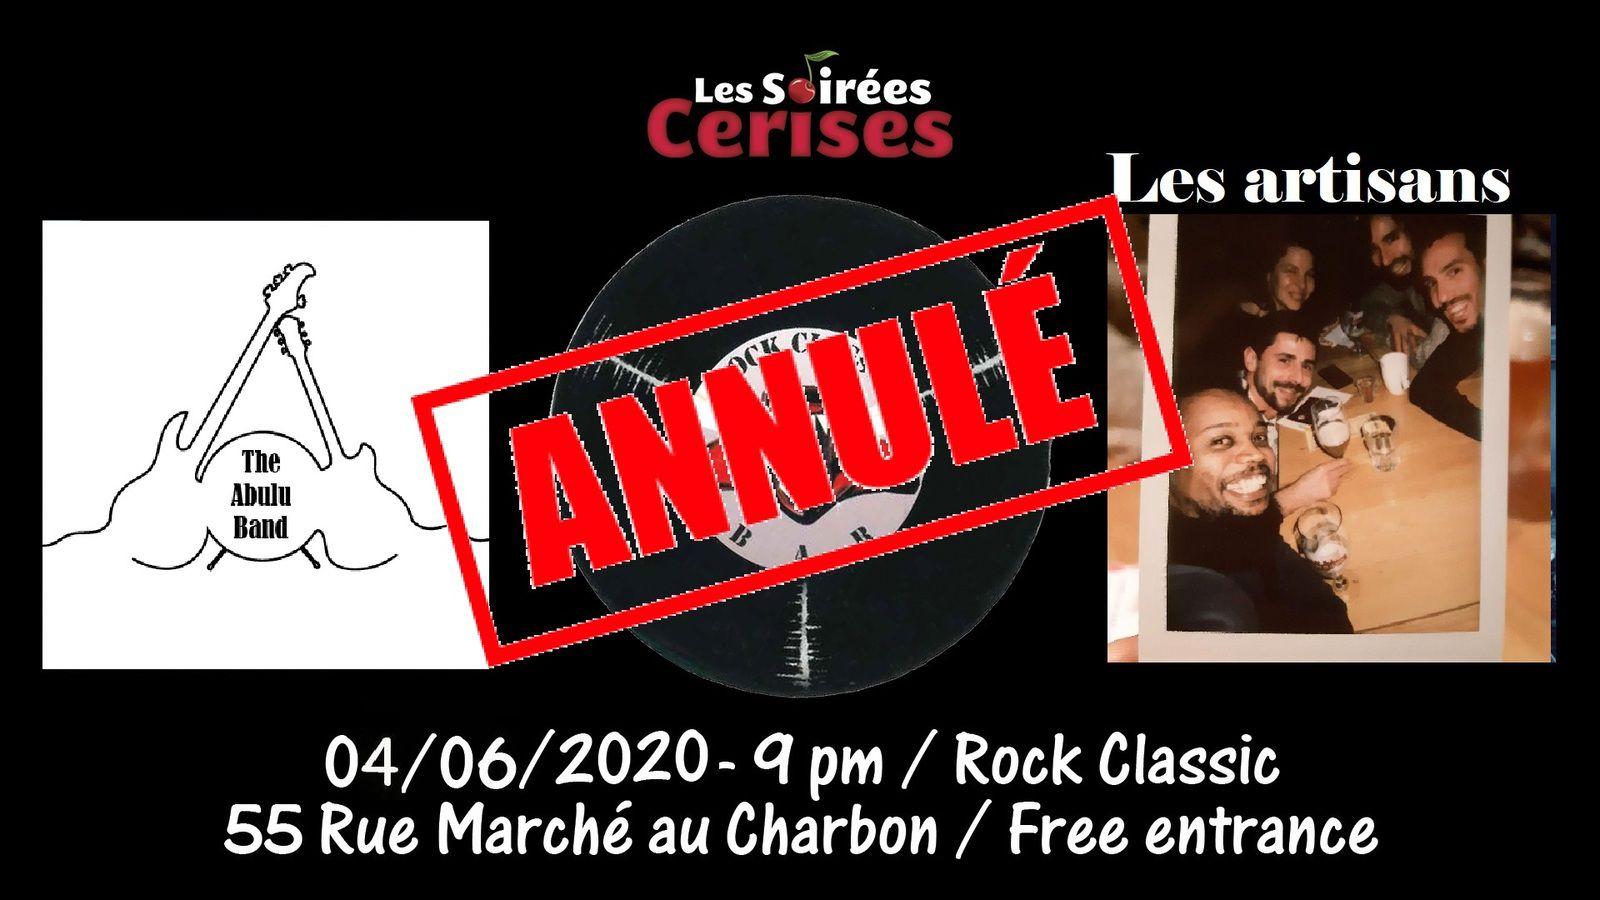 🎵 The Abulu band + Les artisans @ Rock Classic - 04/06/2020 - annulé